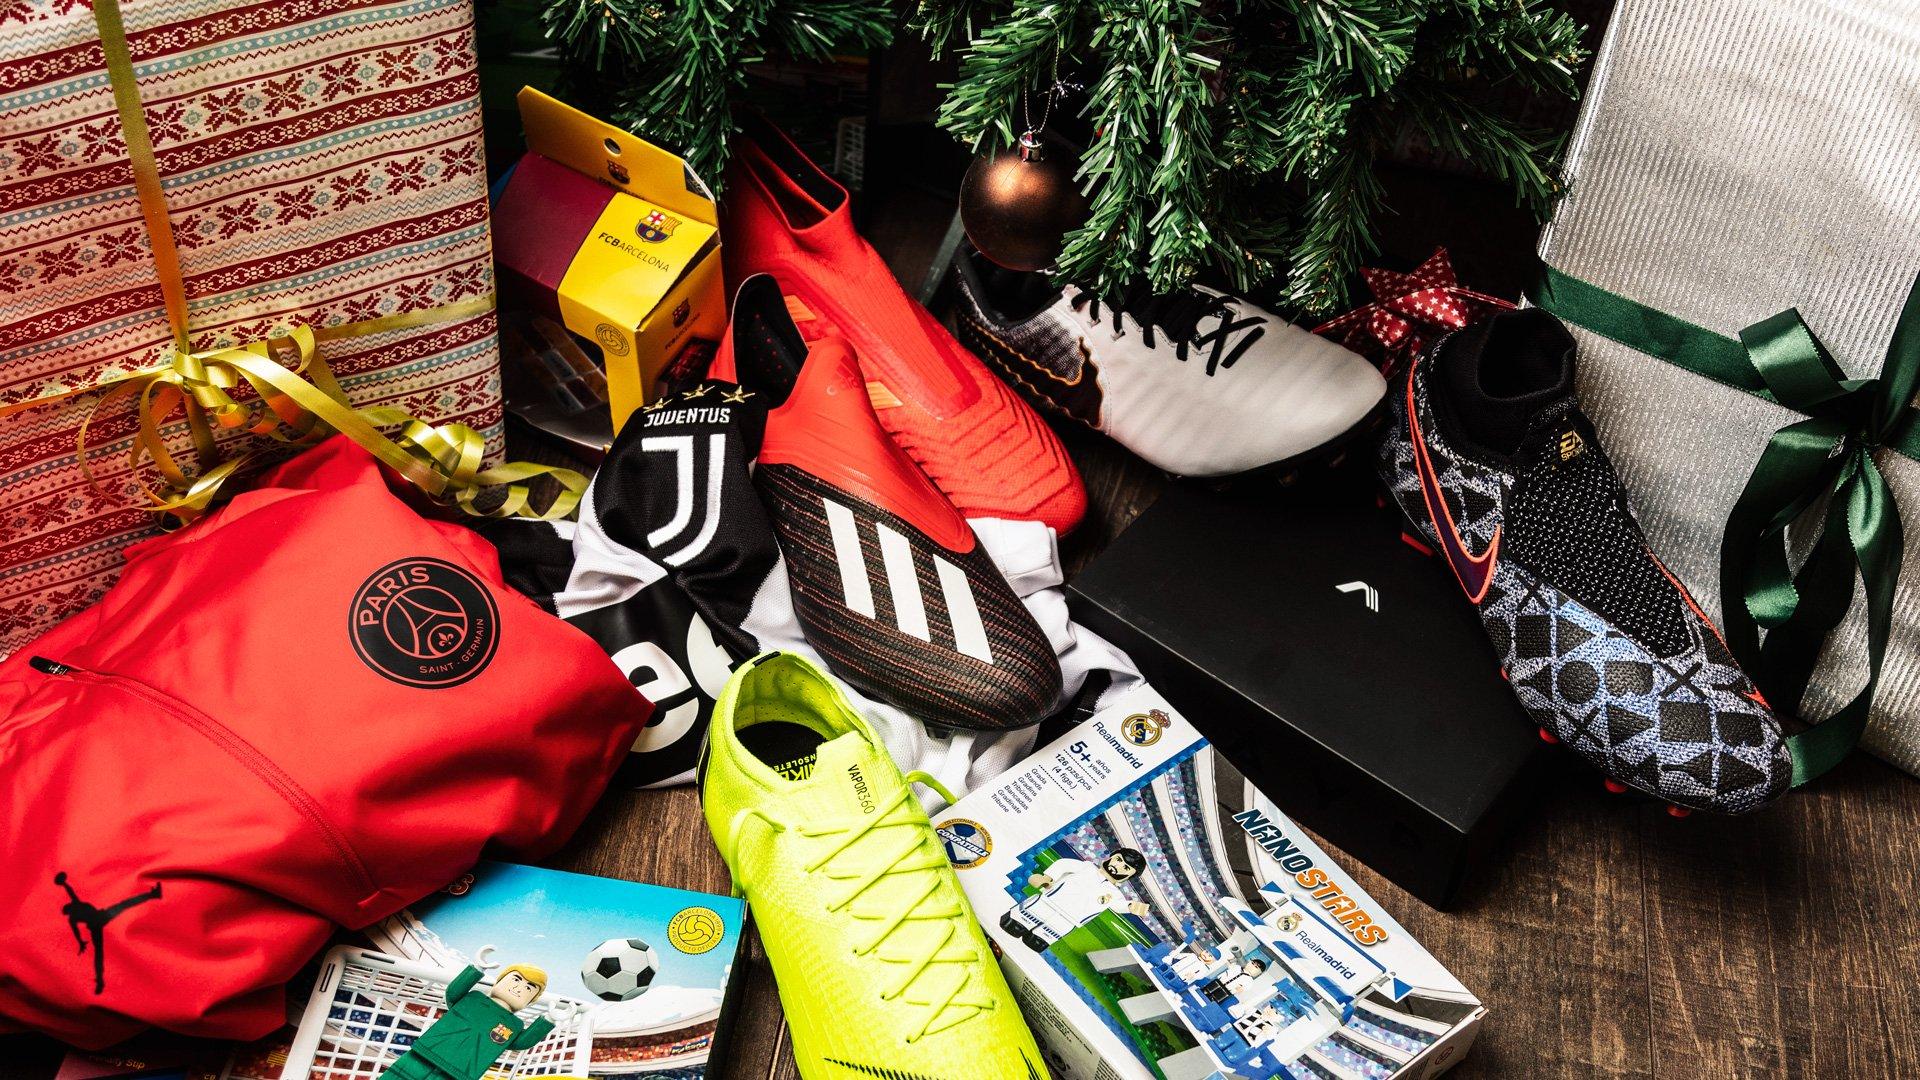 ca40eed4 Unisports ønskeliste for julen 2018 | Se produktene på ønskelisten her